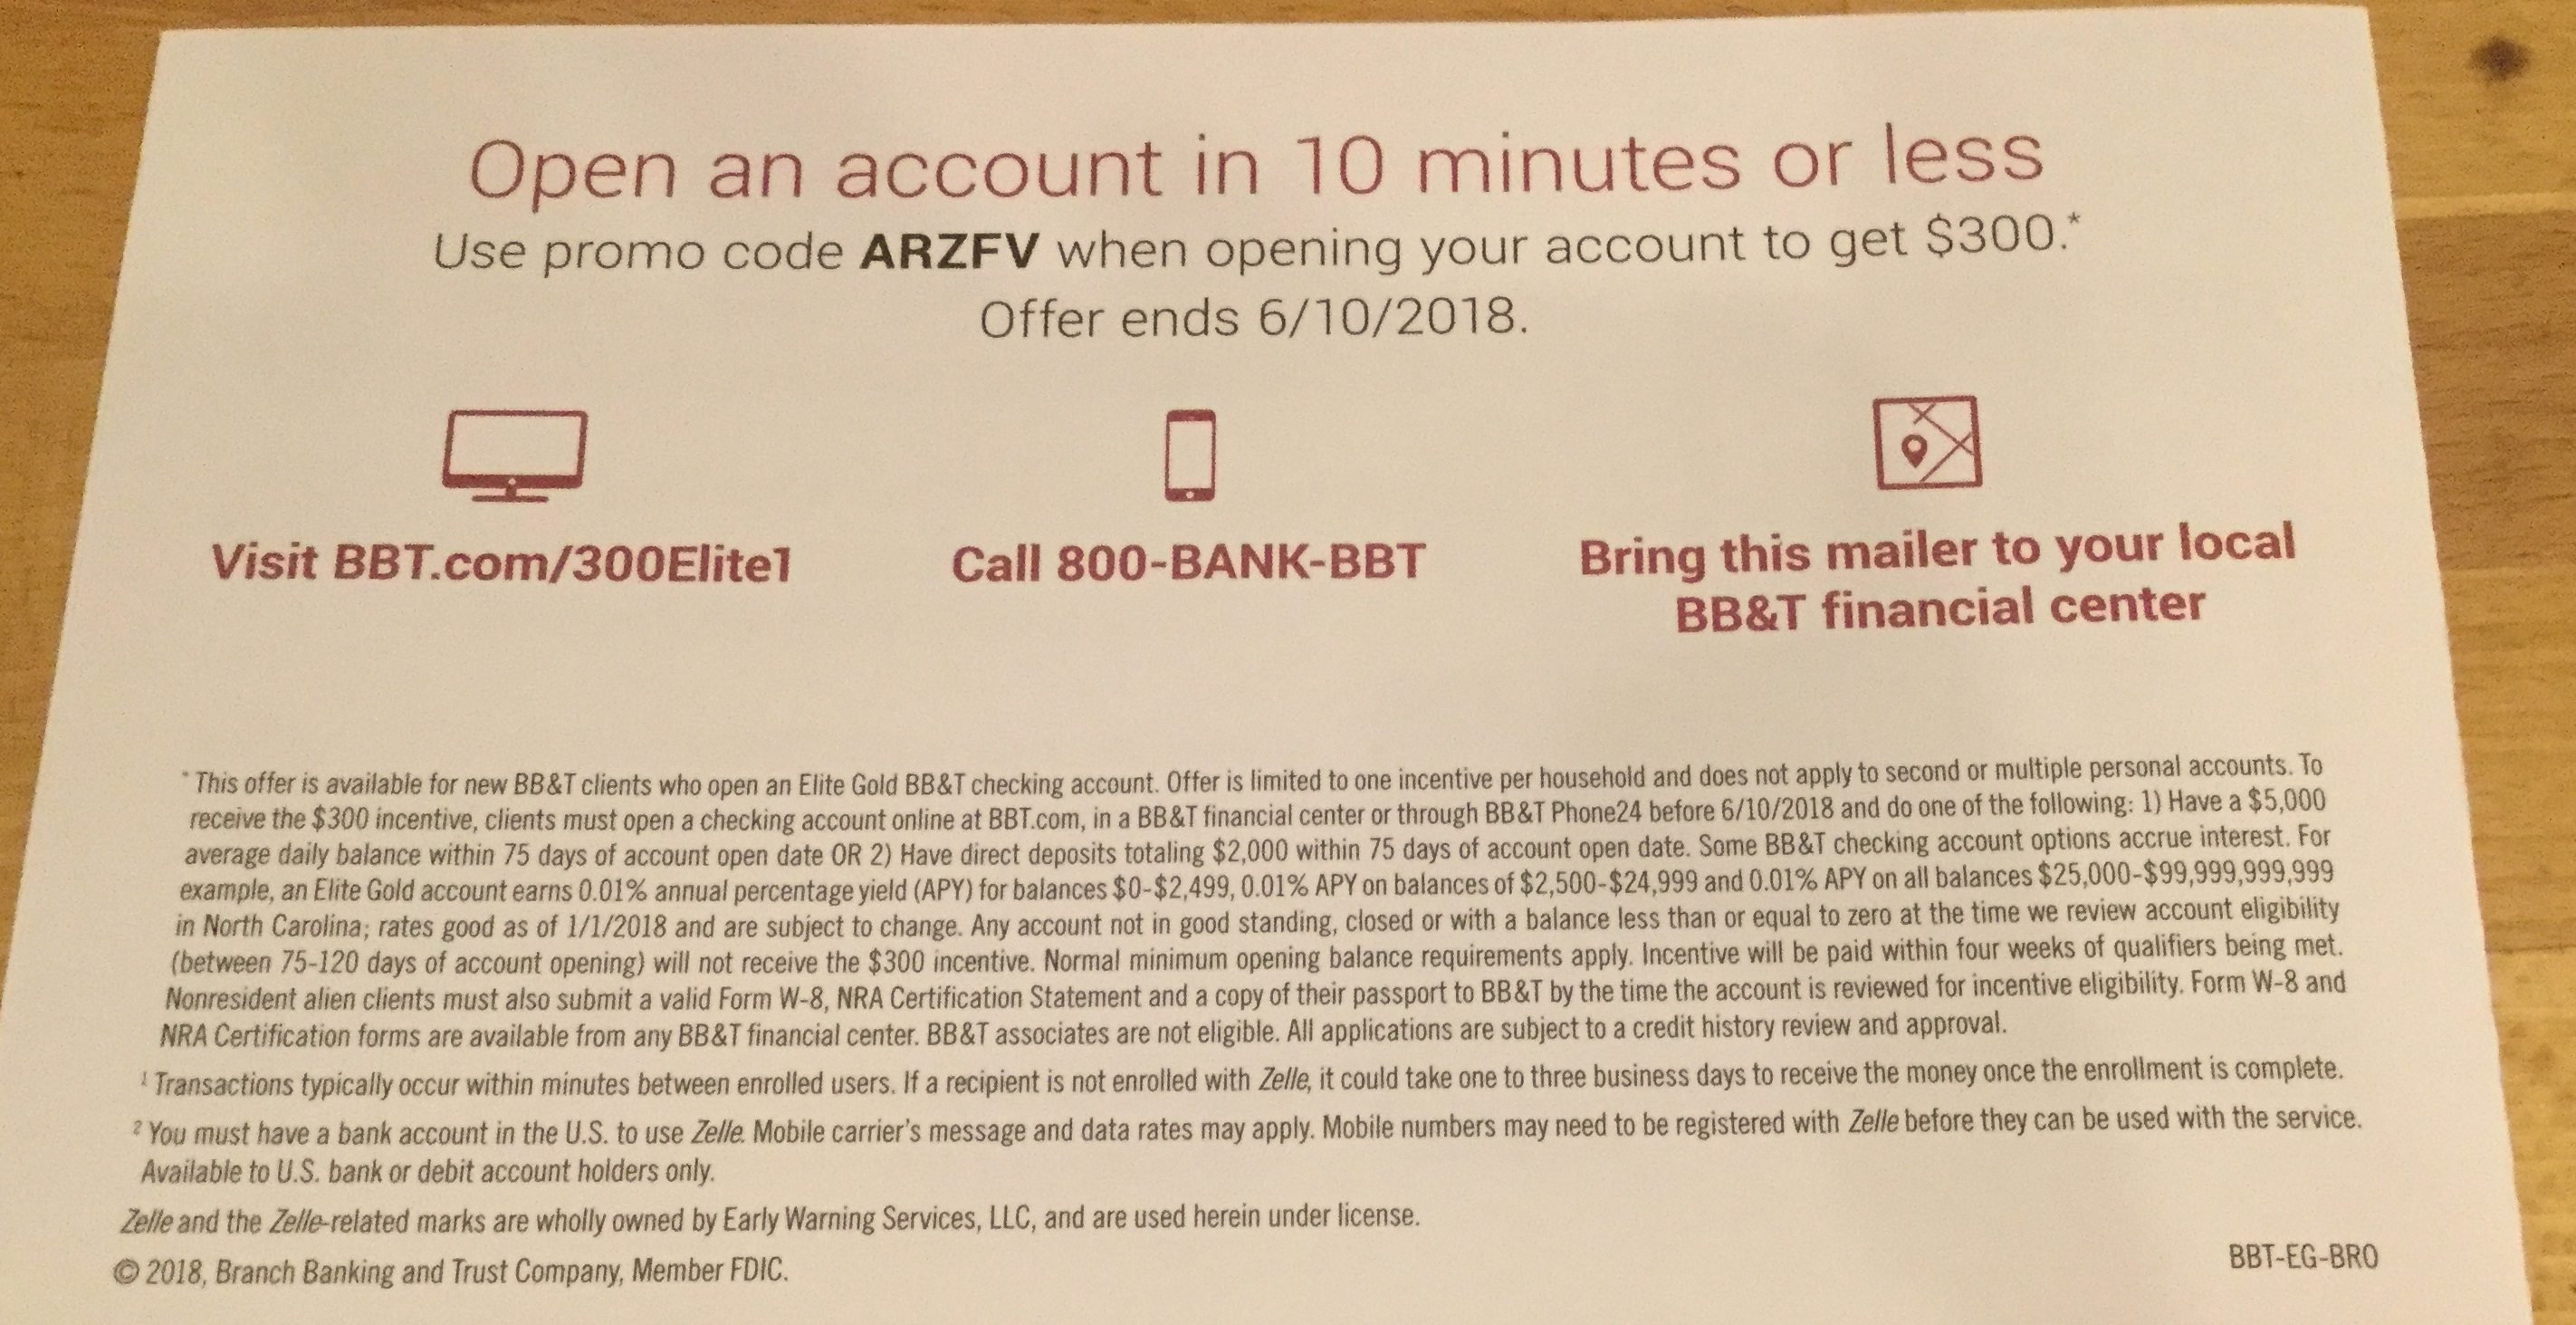 Utexas cash loan image 2